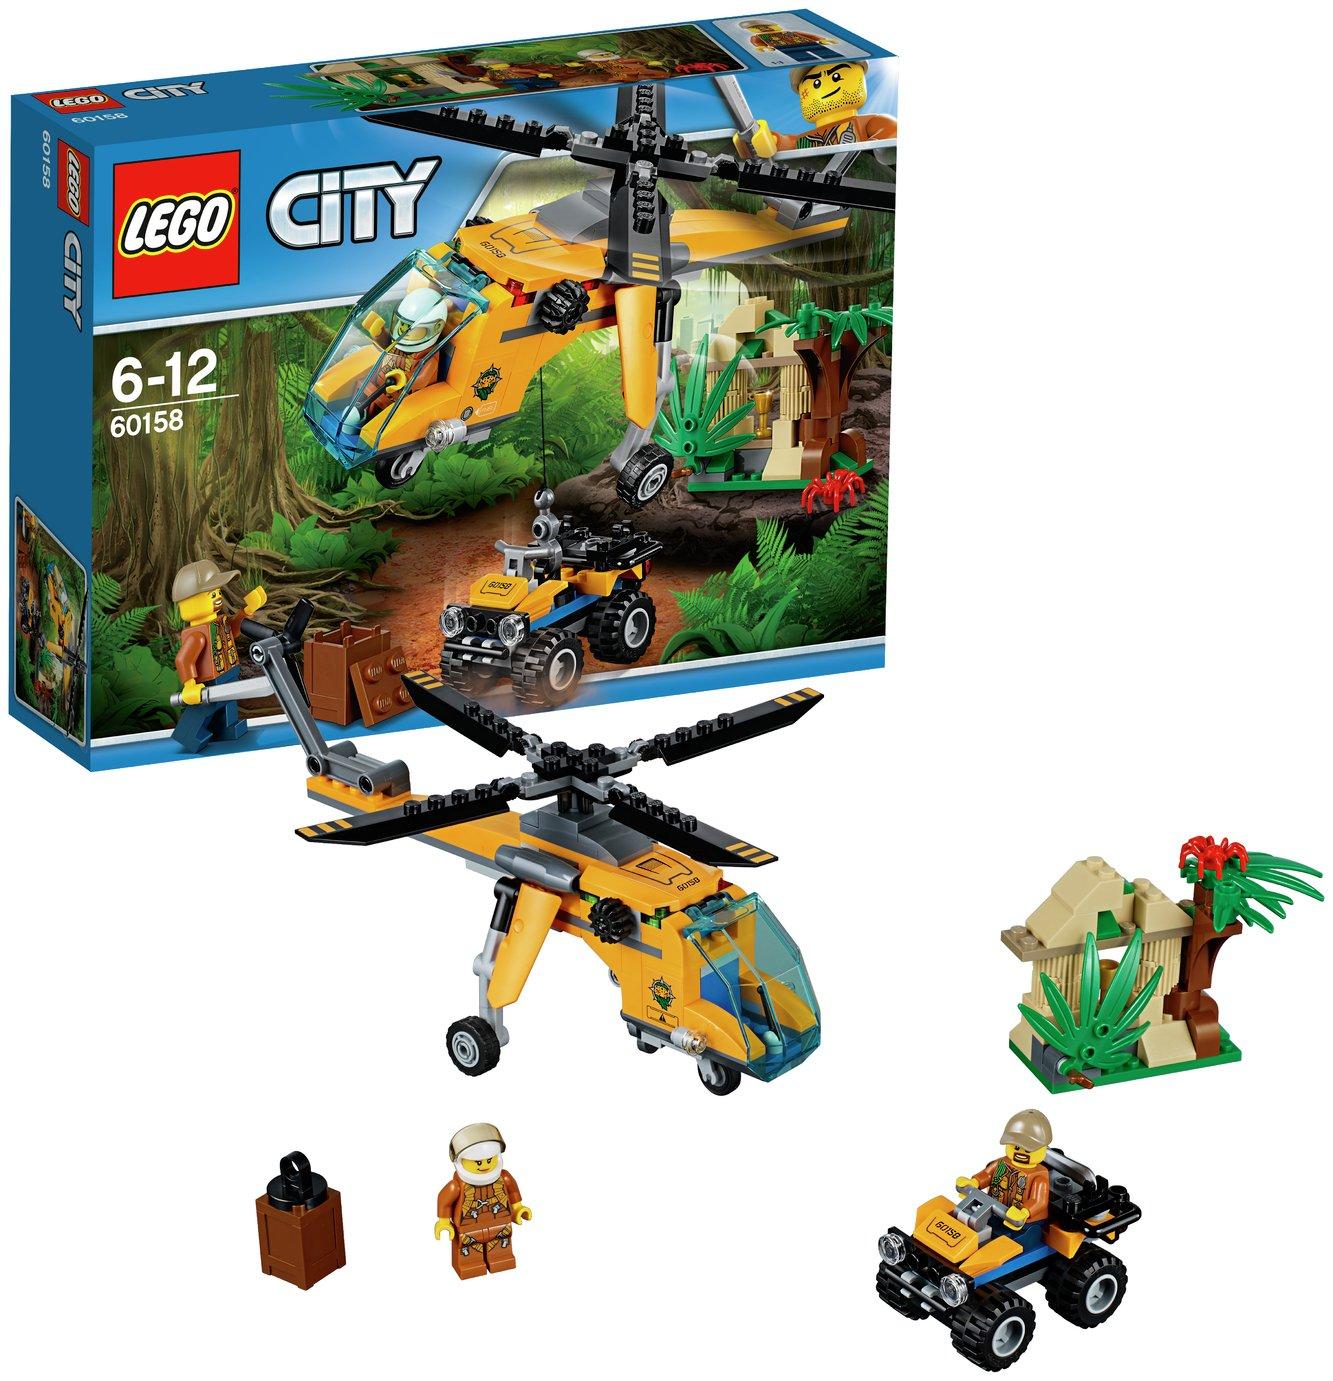 Buy LEGO City Jungle Cargo Helicopter - 60158   LEGO   Argos